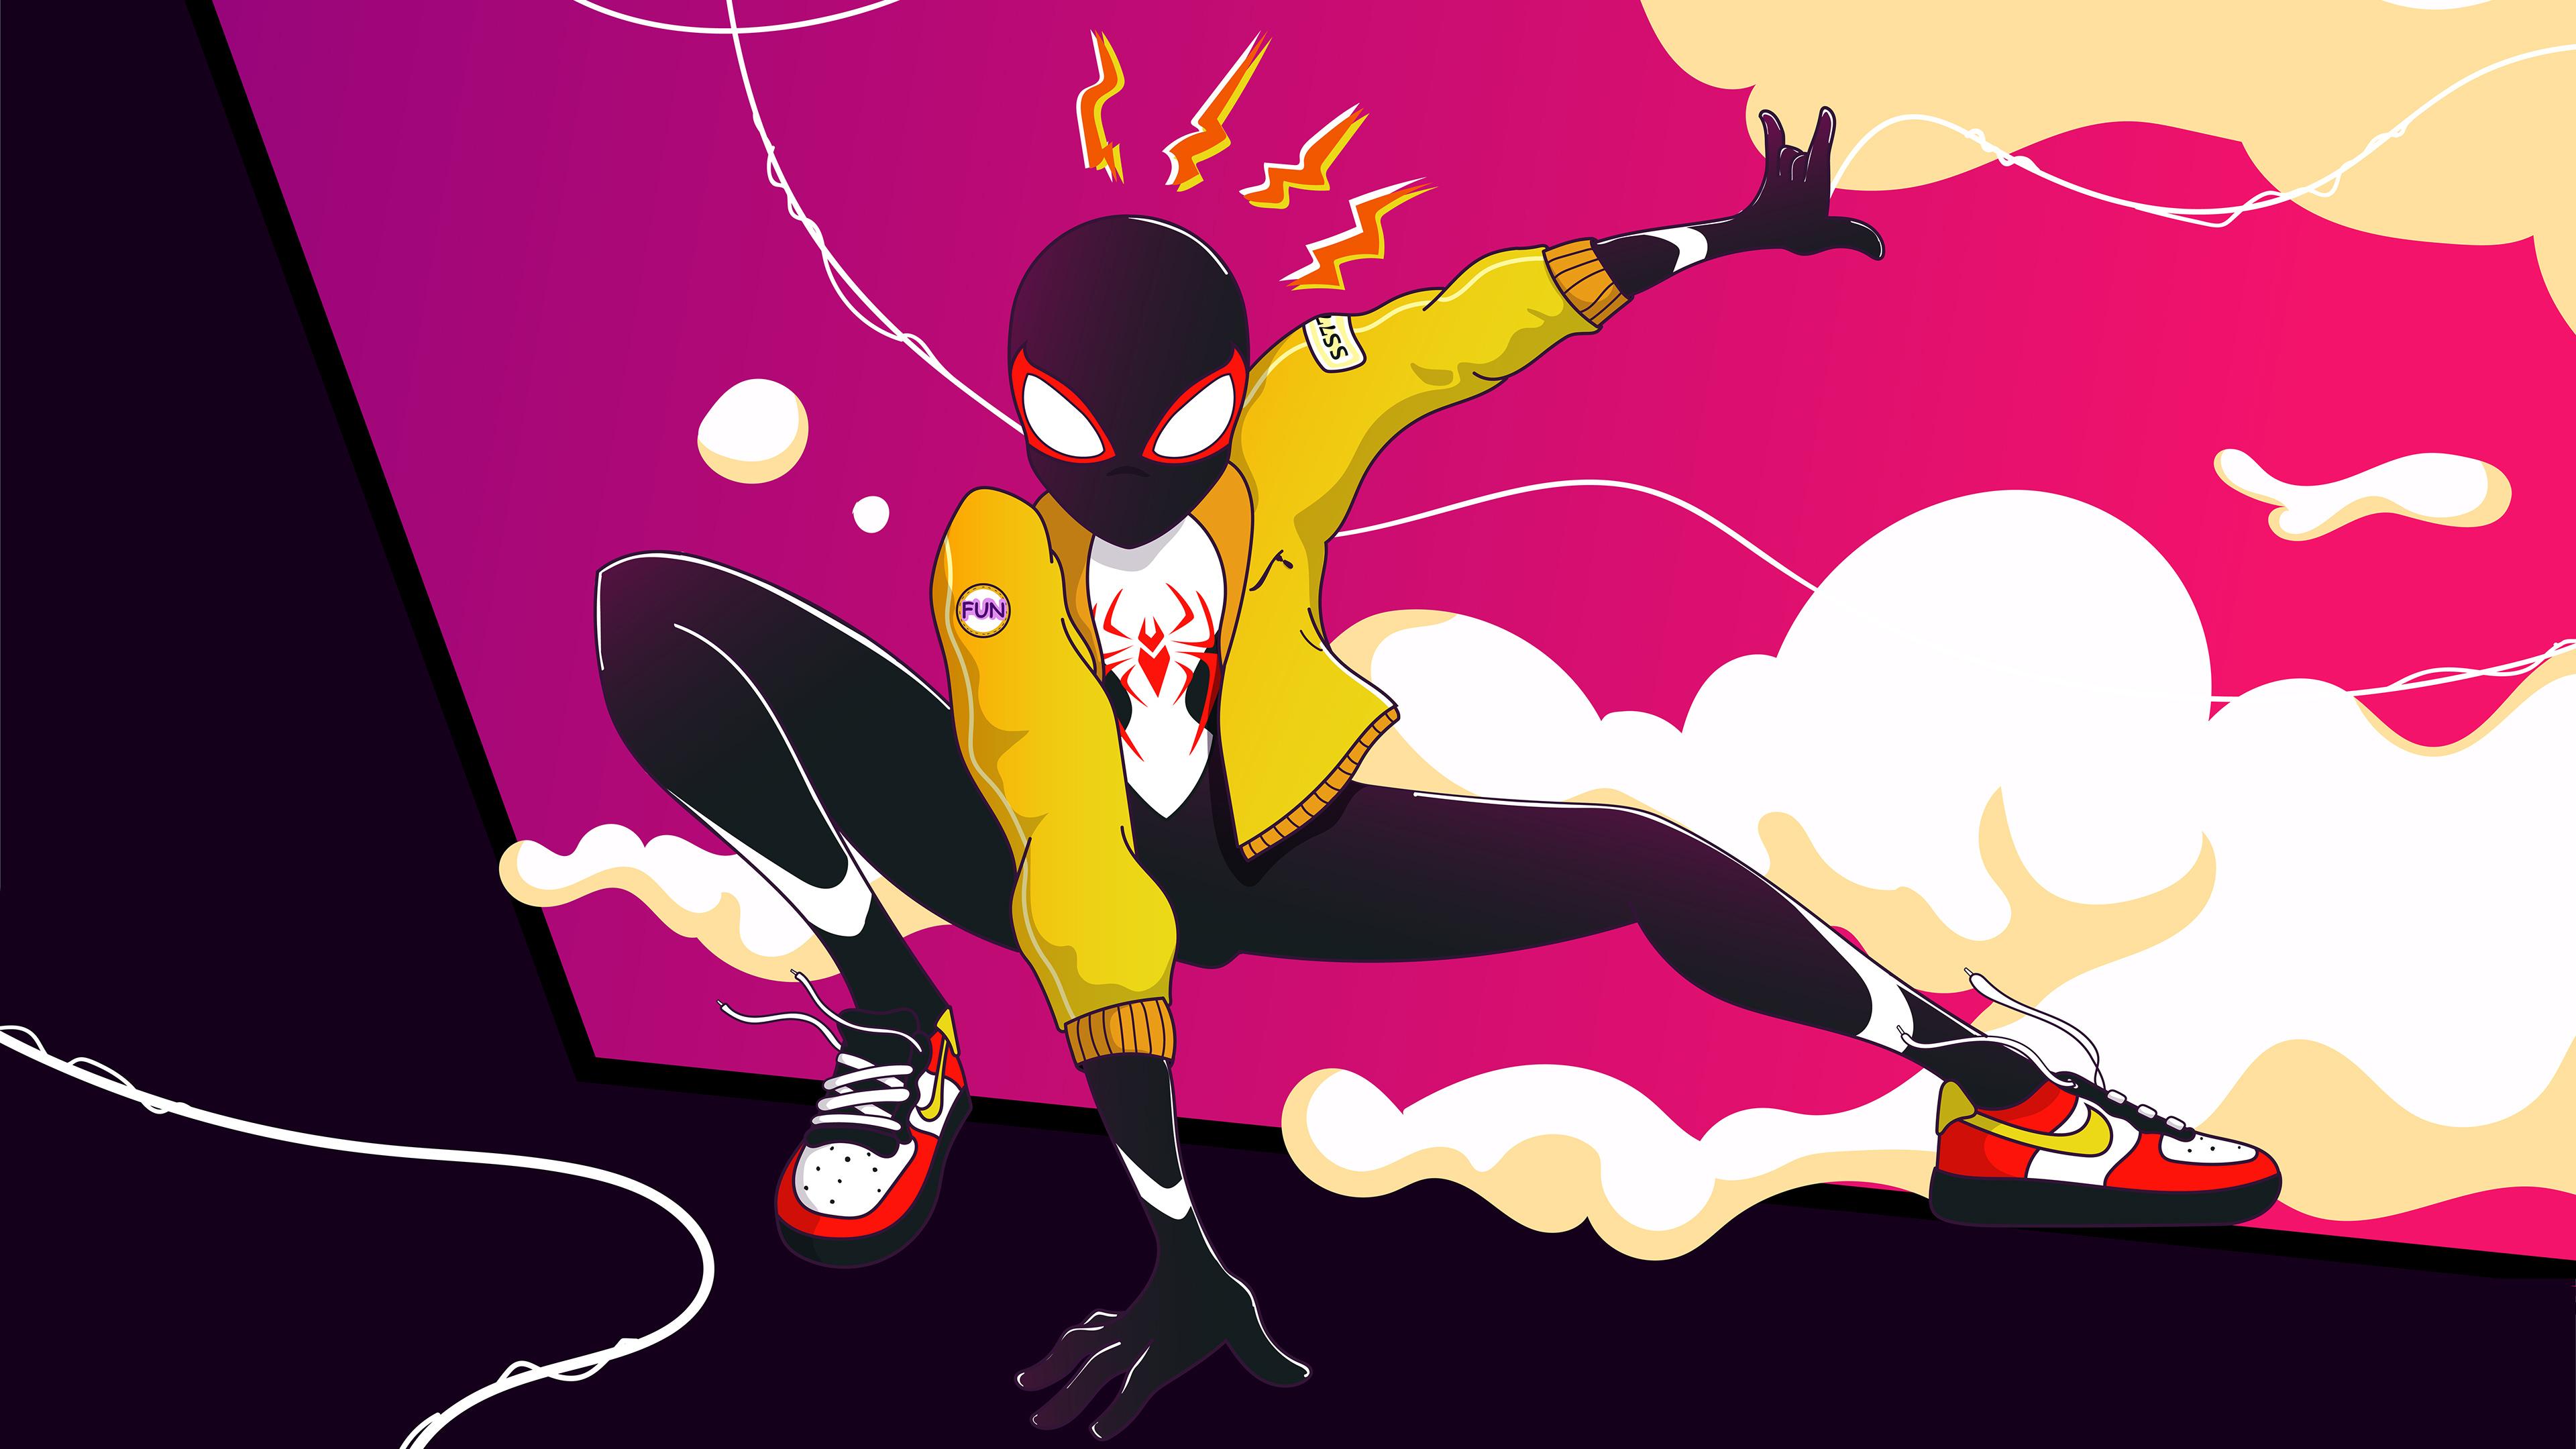 spidersona 4k 1556184886 - Spidersona 4k - superheroes wallpapers, spiderman wallpapers, spiderman into the spider verse wallpapers, hd-wallpapers, digital art wallpapers, behance wallpapers, artwork wallpapers, artist wallpapers, 4k-wallpapers